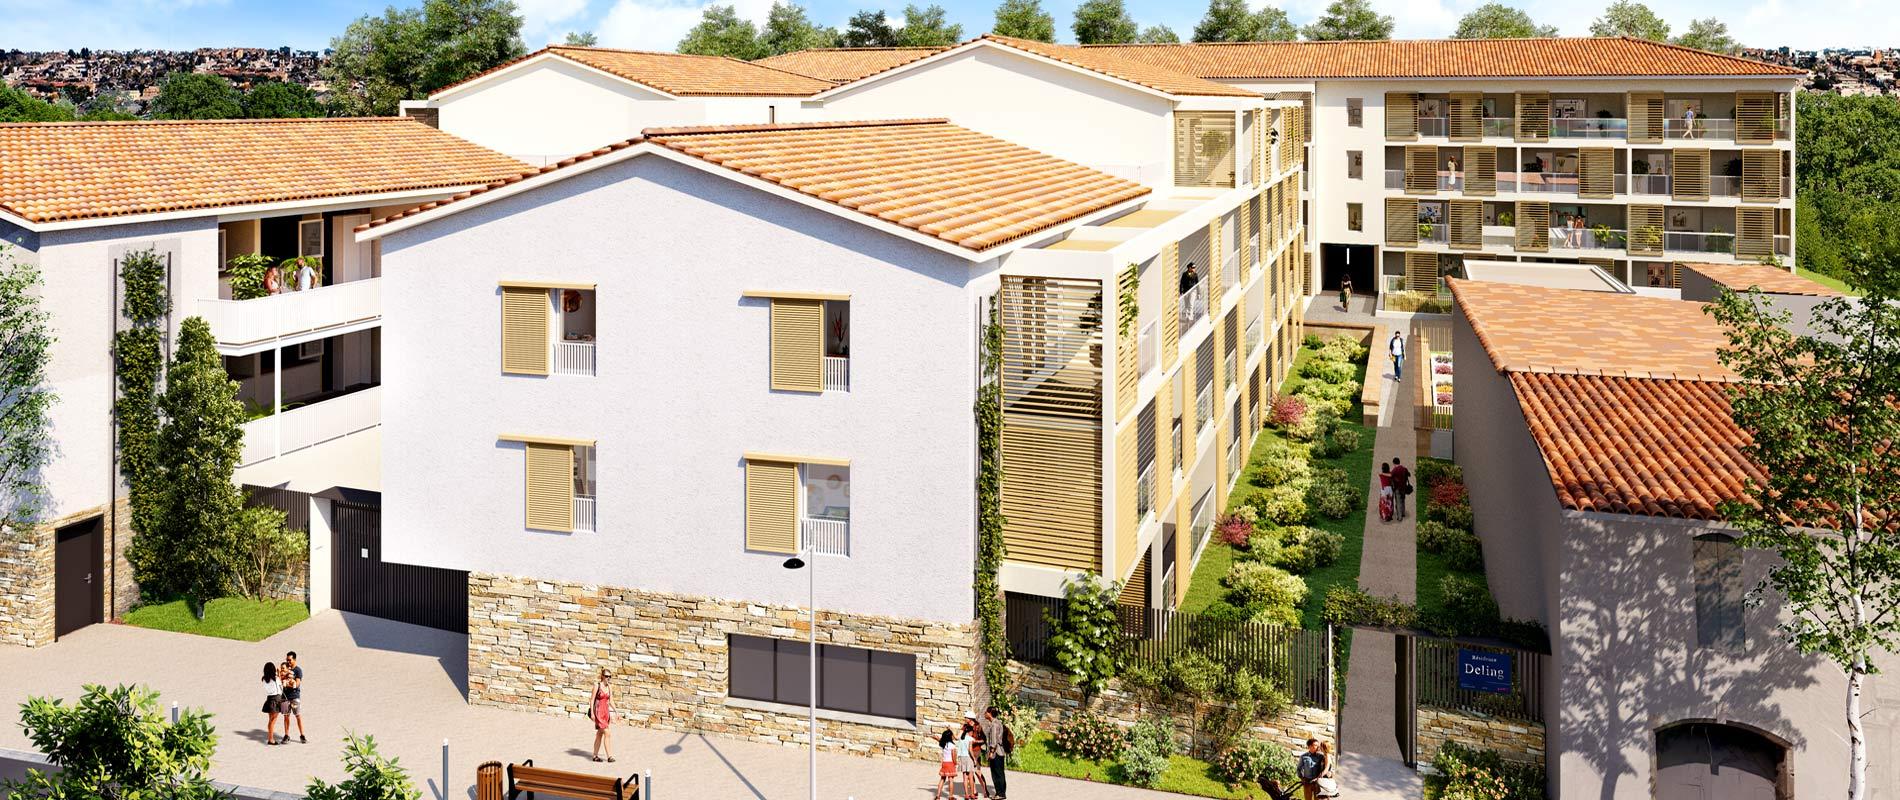 ideom-residence-deling-jardin-milhaud